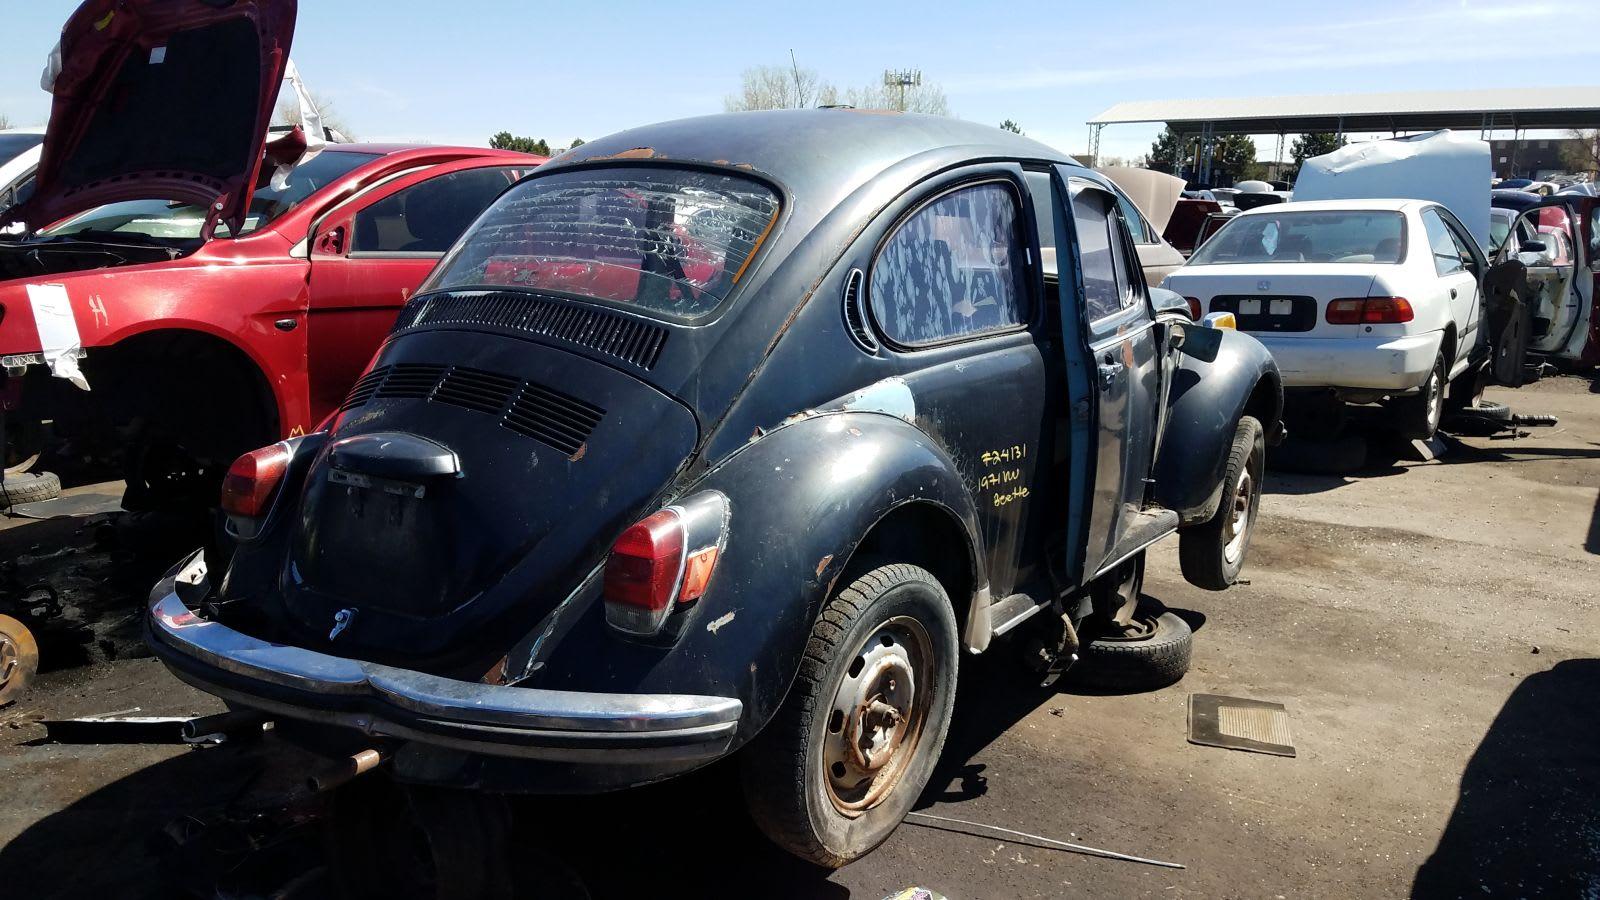 1971 Volkswagen Super Beetle in Colorado wrecking yard